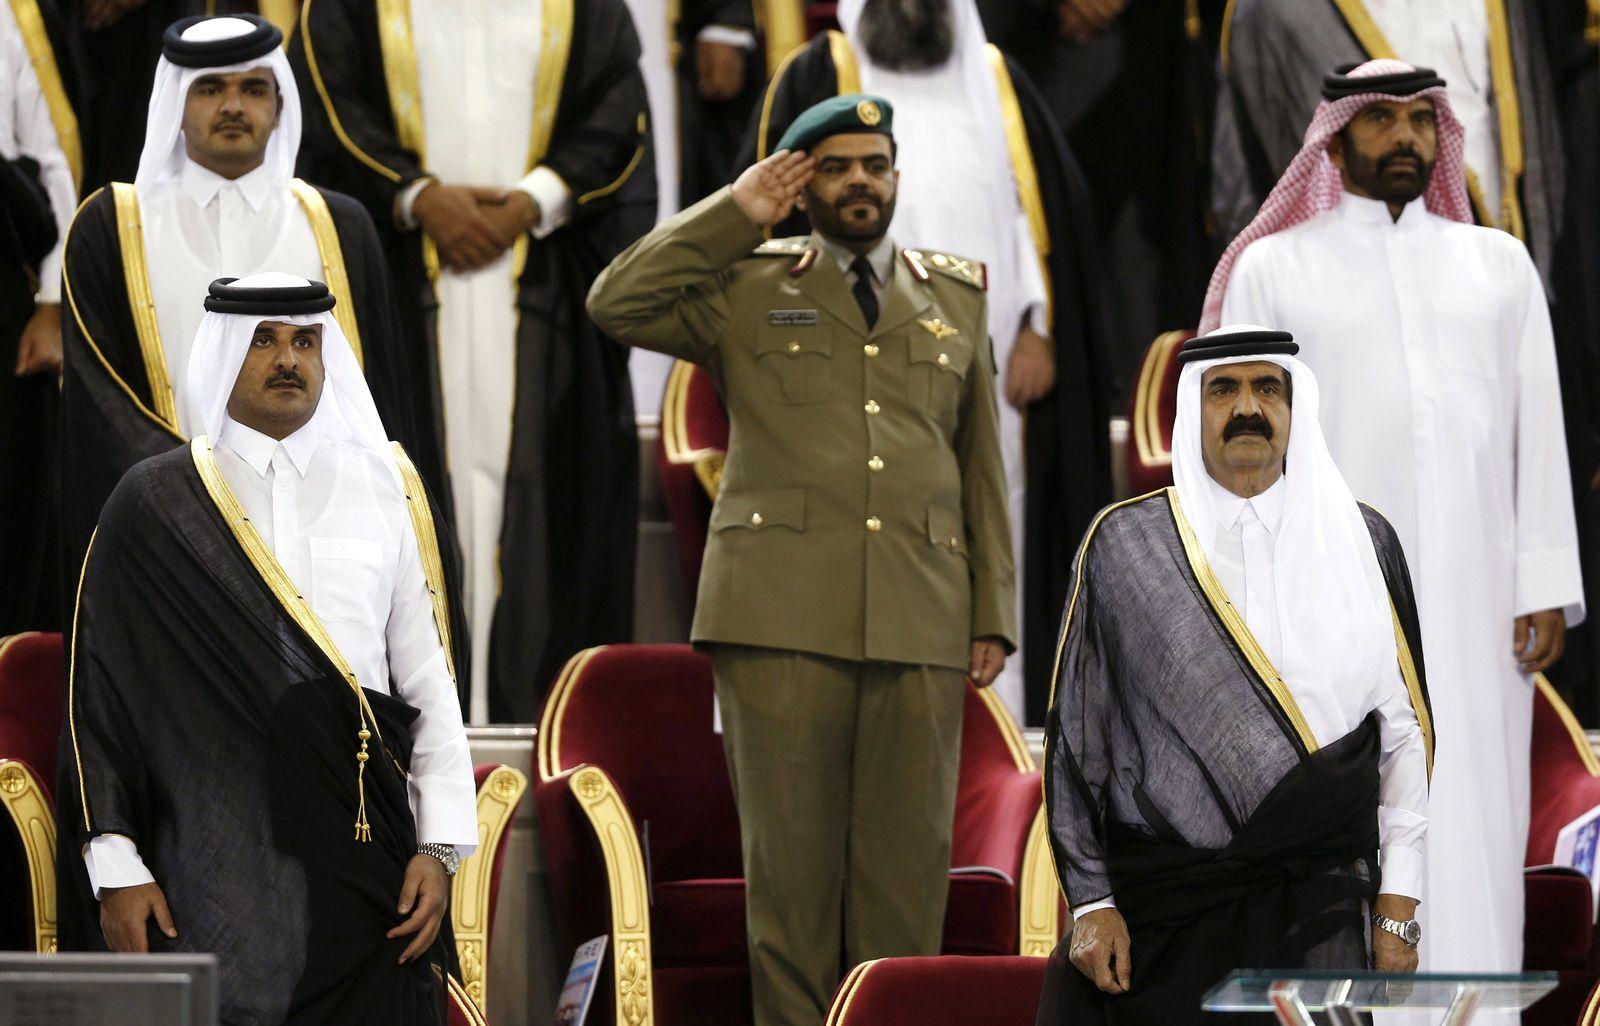 Katar/ Hamad bin Khalifa al-Thani